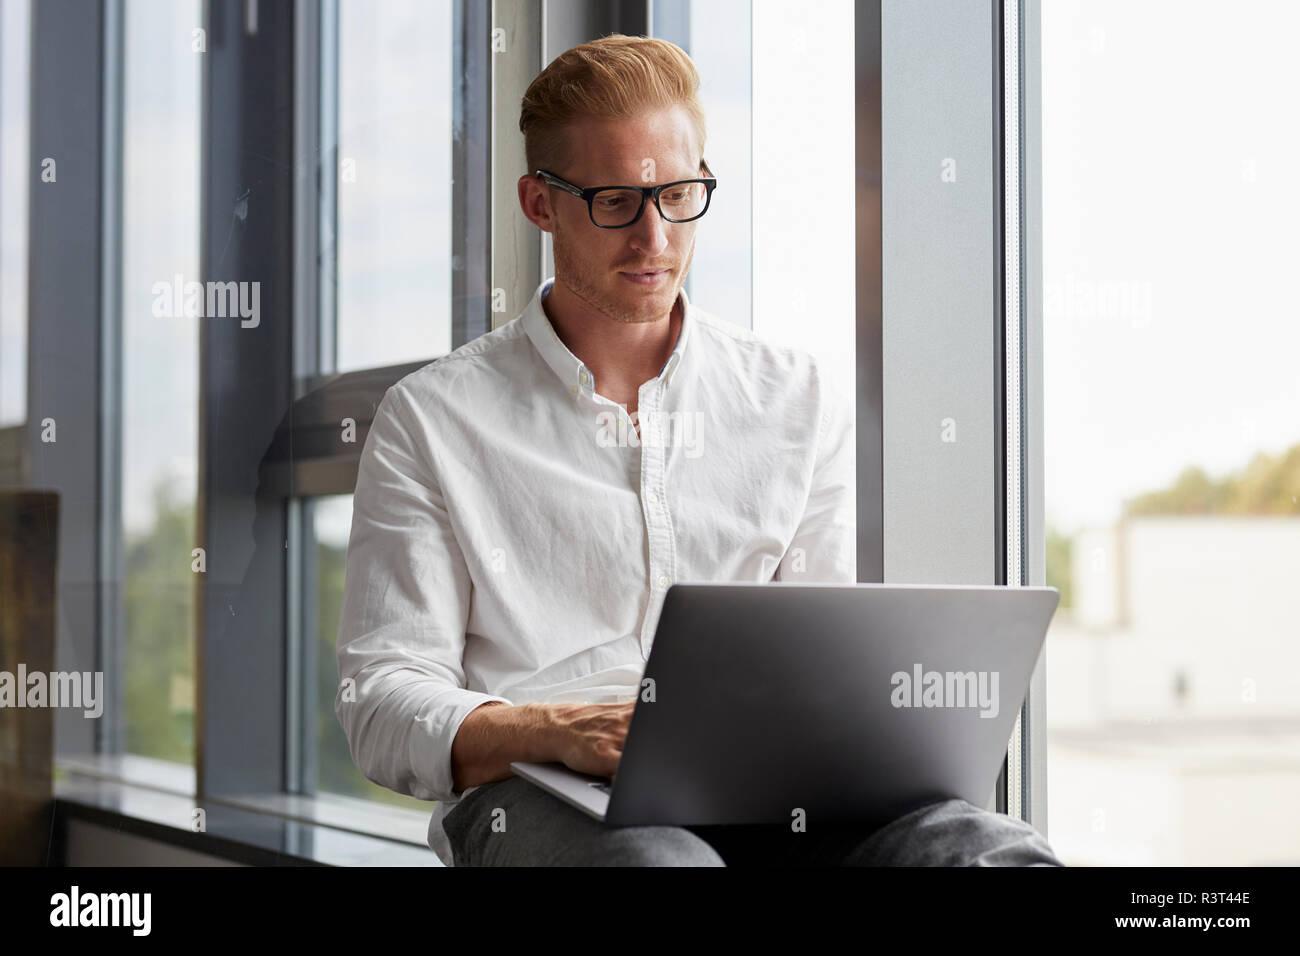 Businessman sitting on windowsill using laptop - Stock Image